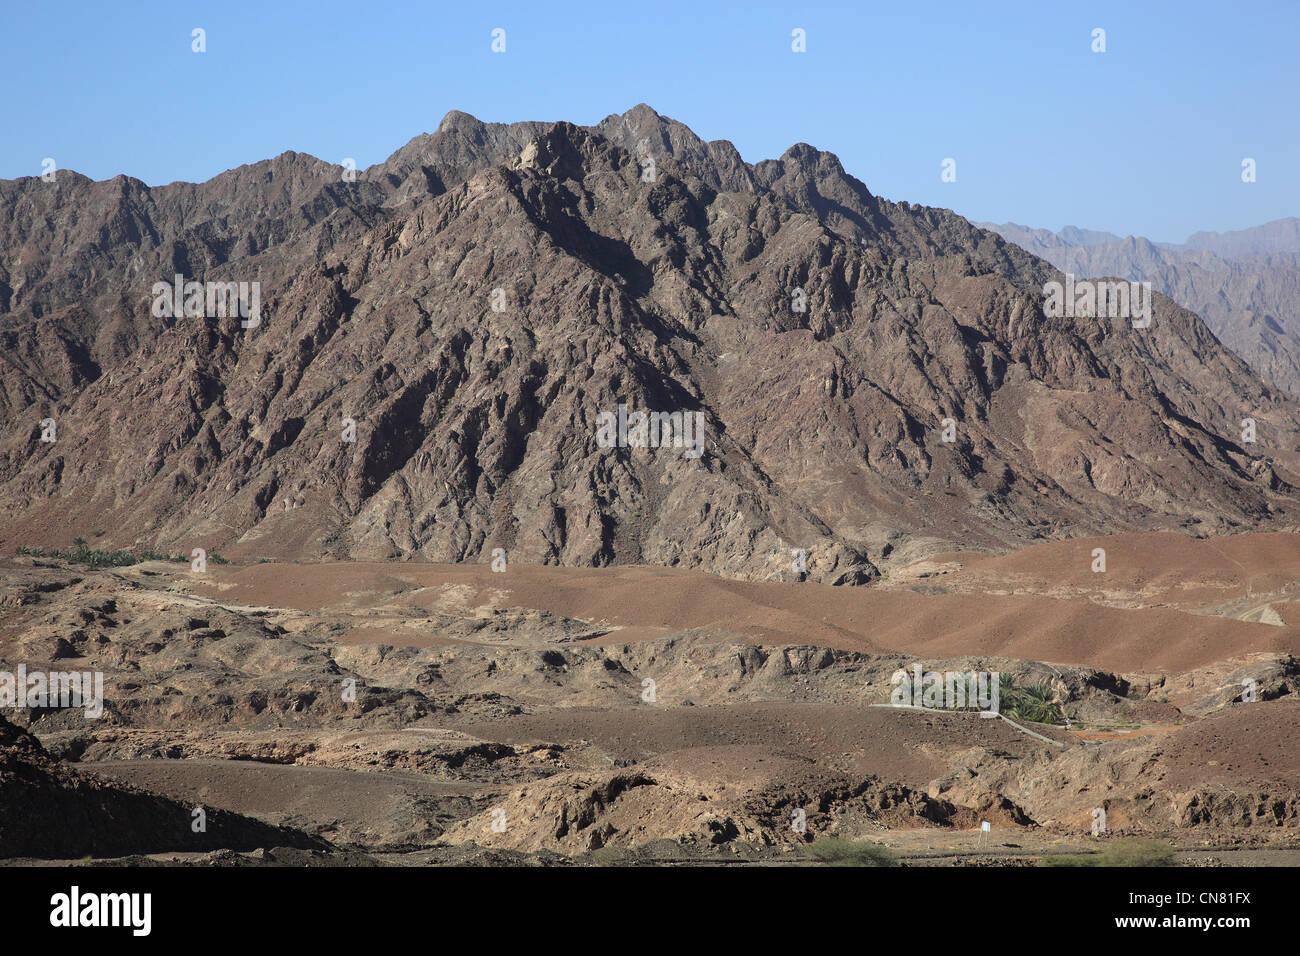 Landschaft am Jebel Shams, Oman Stock Photo